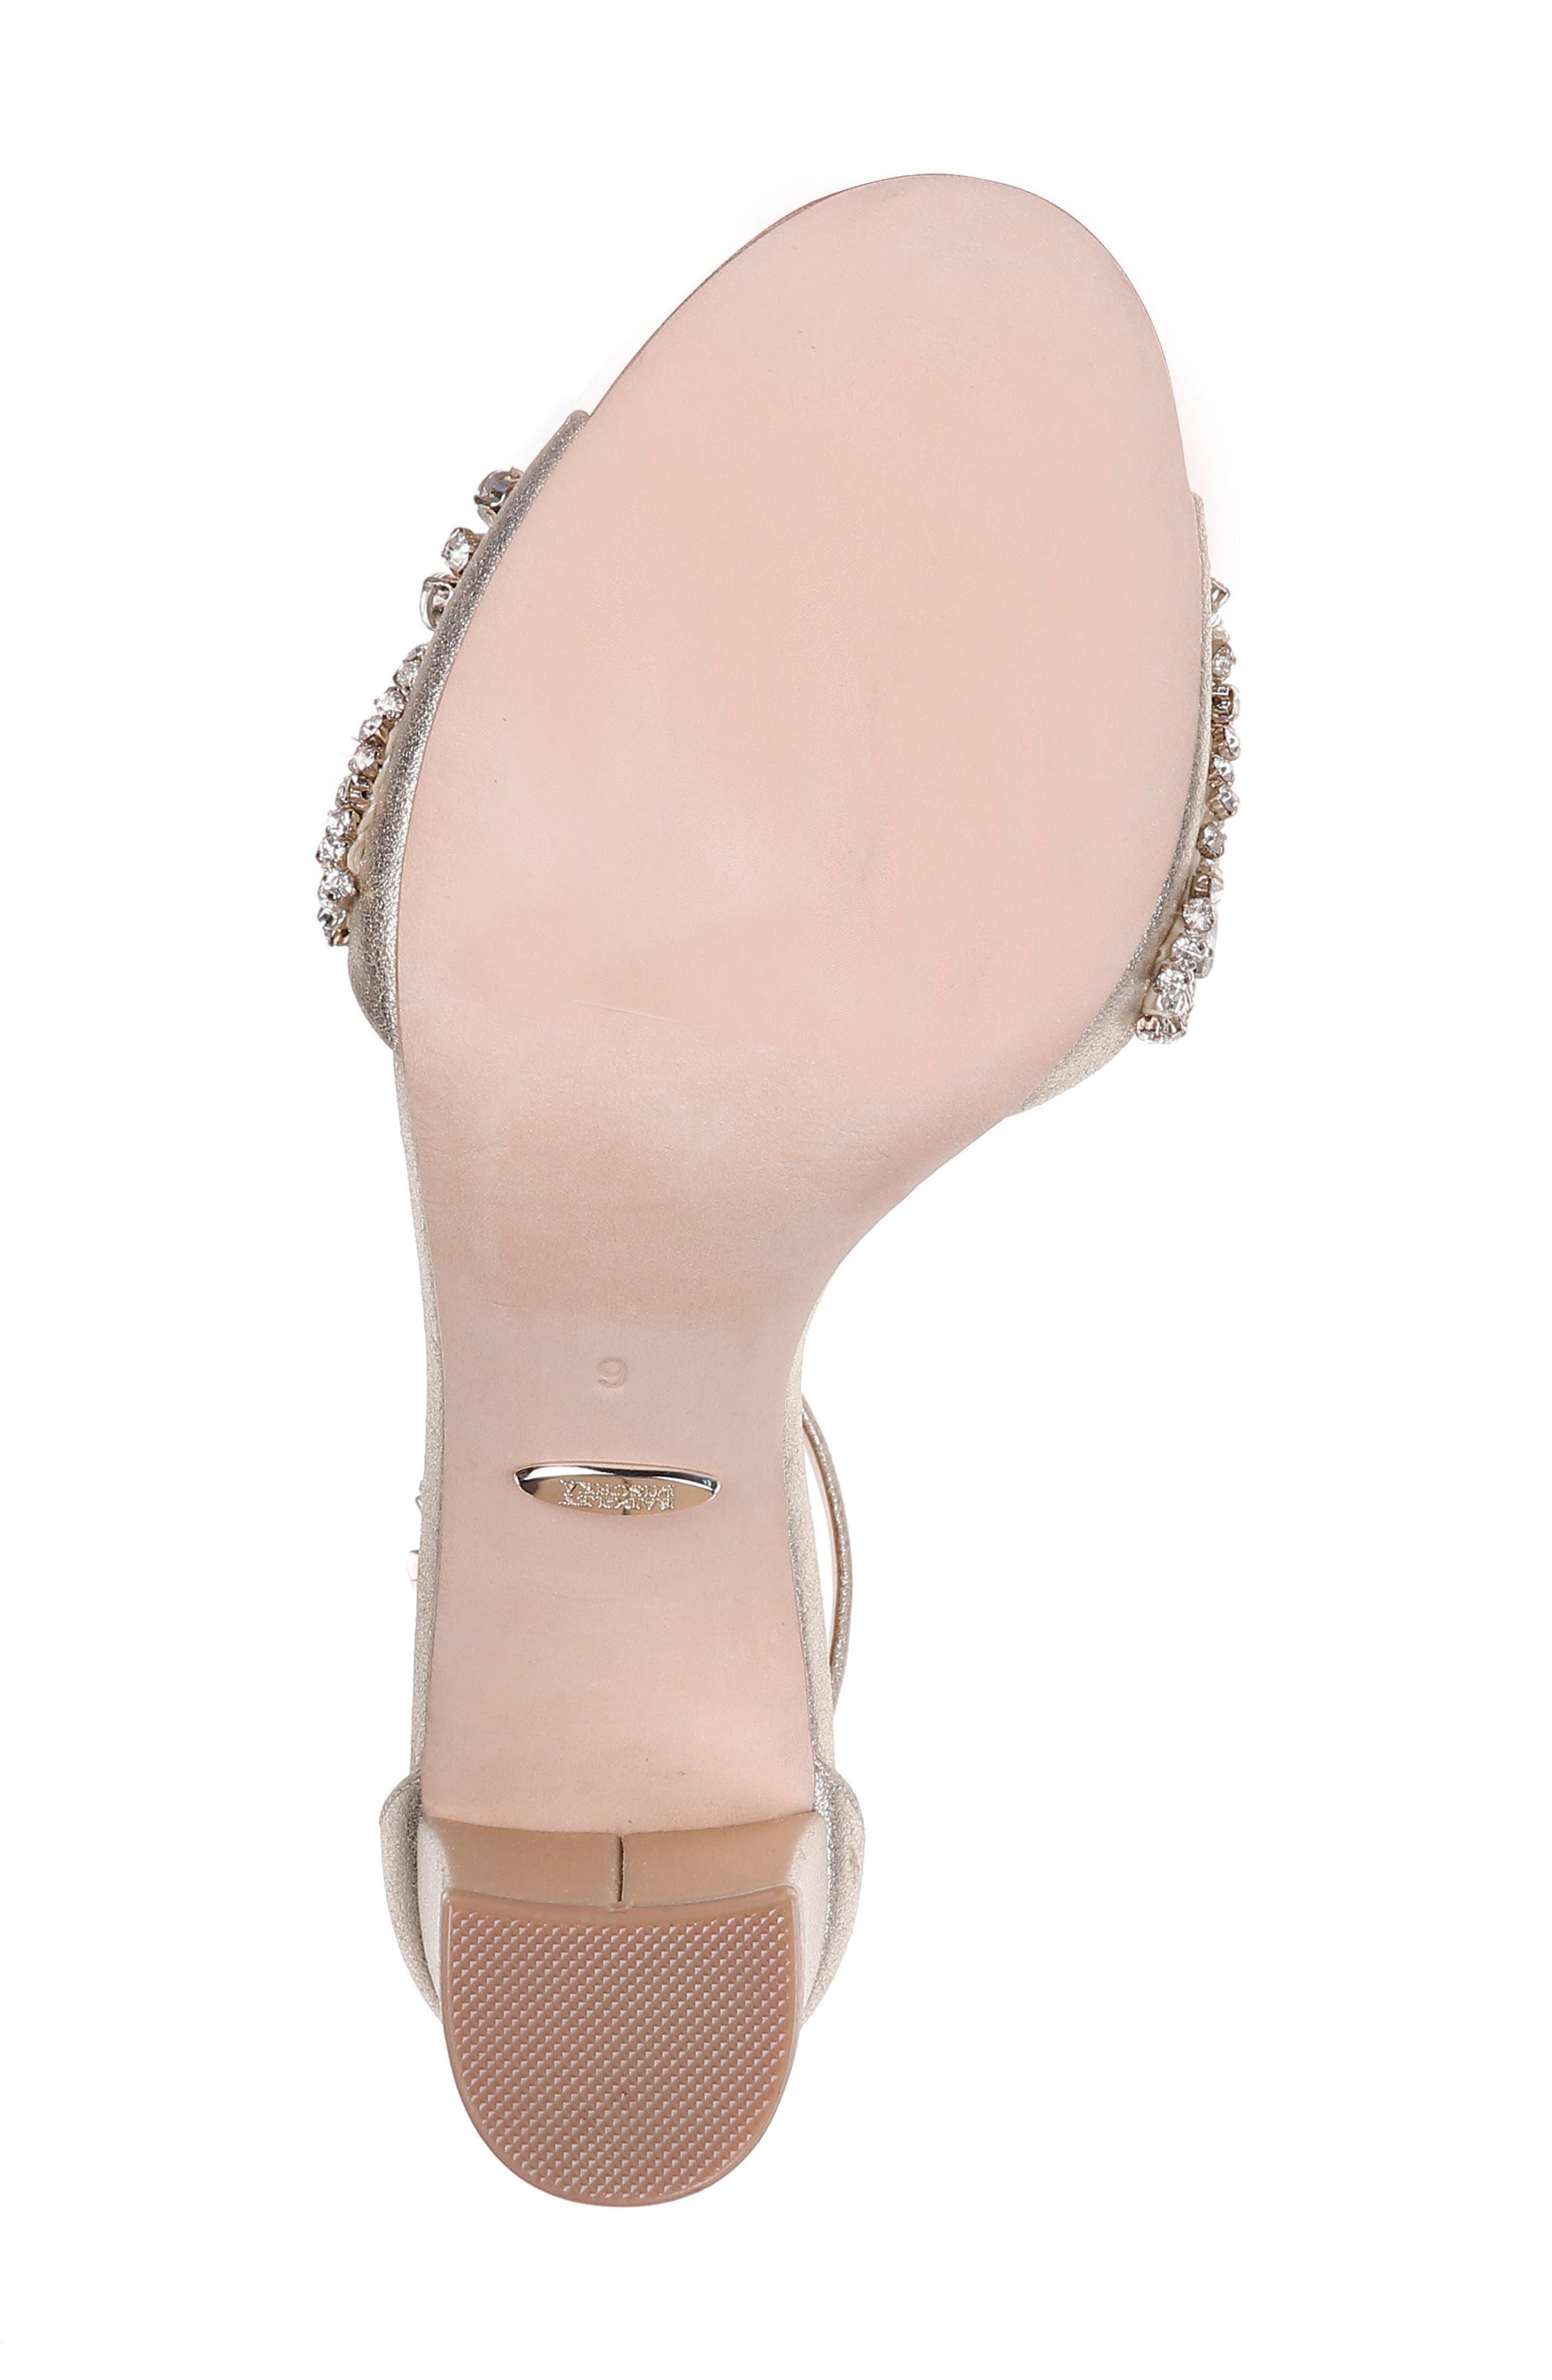 Hines Embellished Block Heel Sandal,                             Alternate thumbnail 26, color,